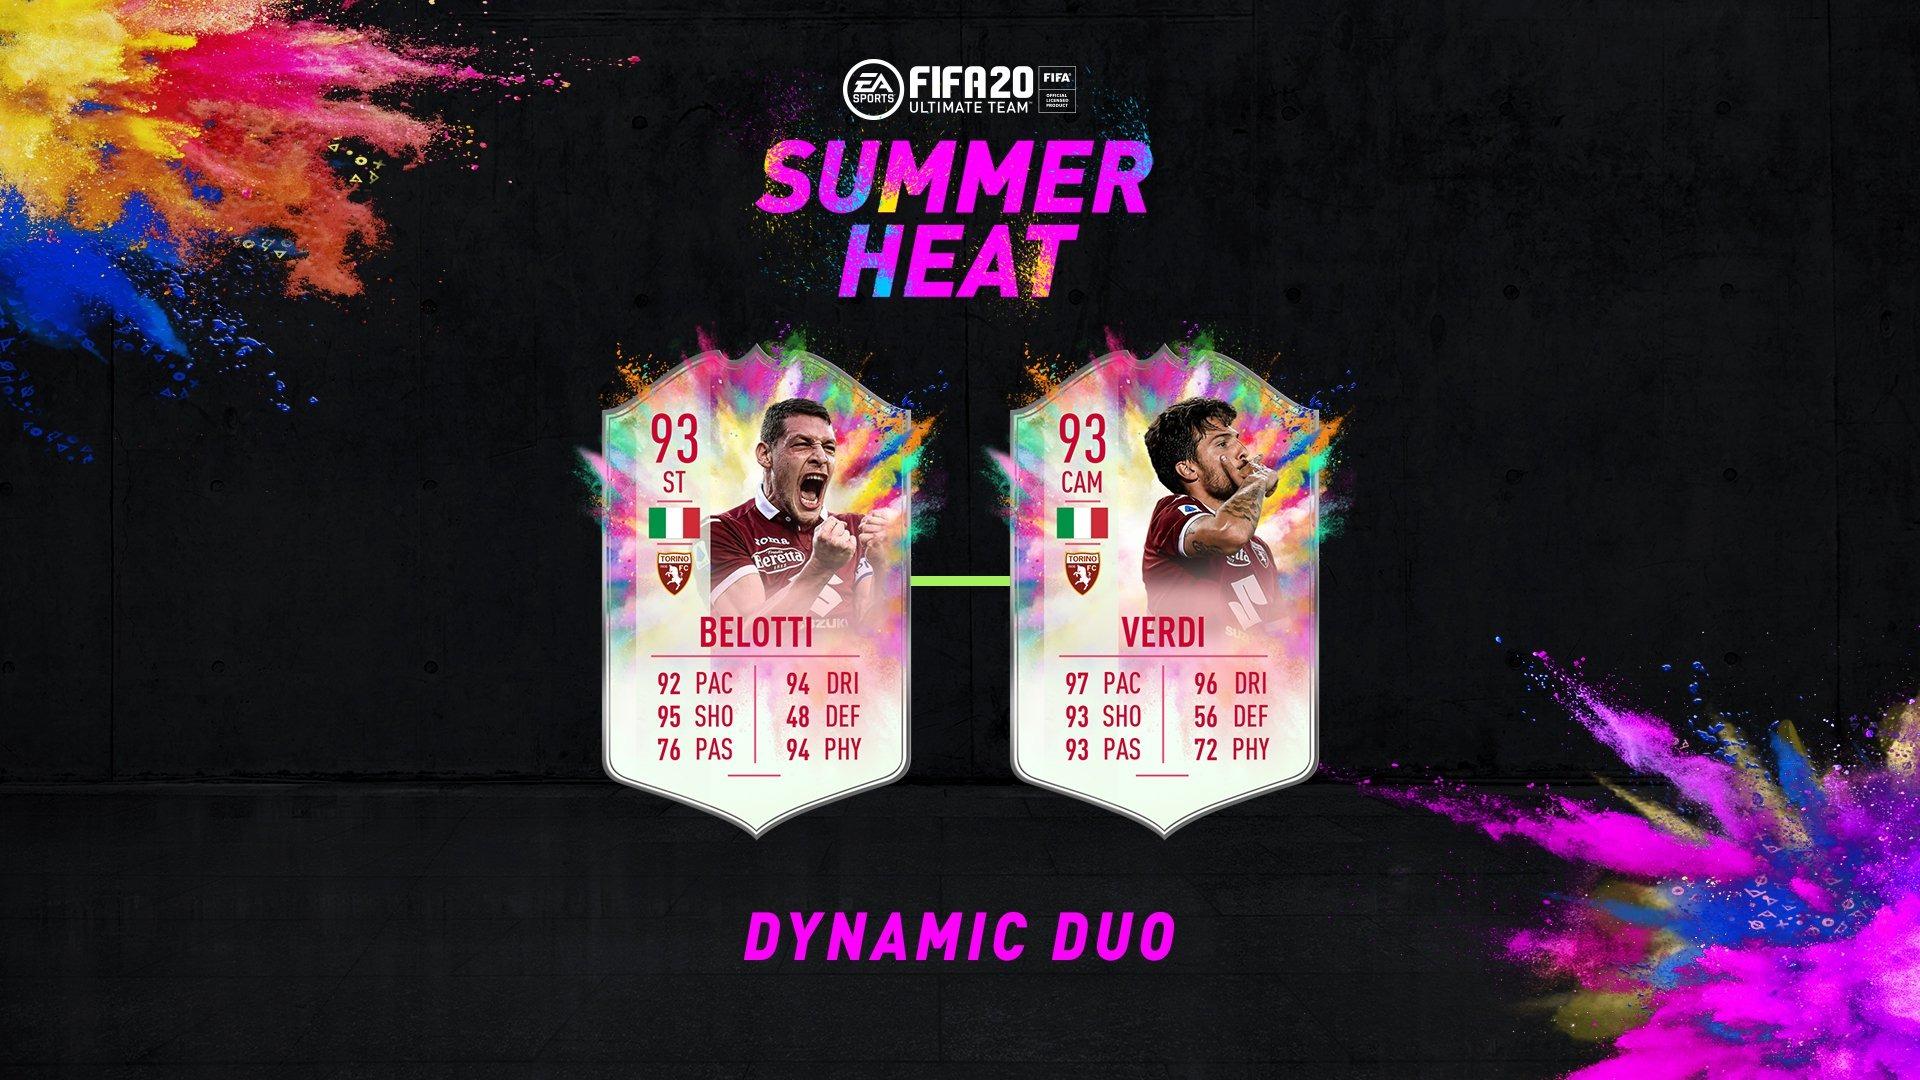 Belotti Verdi Summer Heat Dynamic DUo